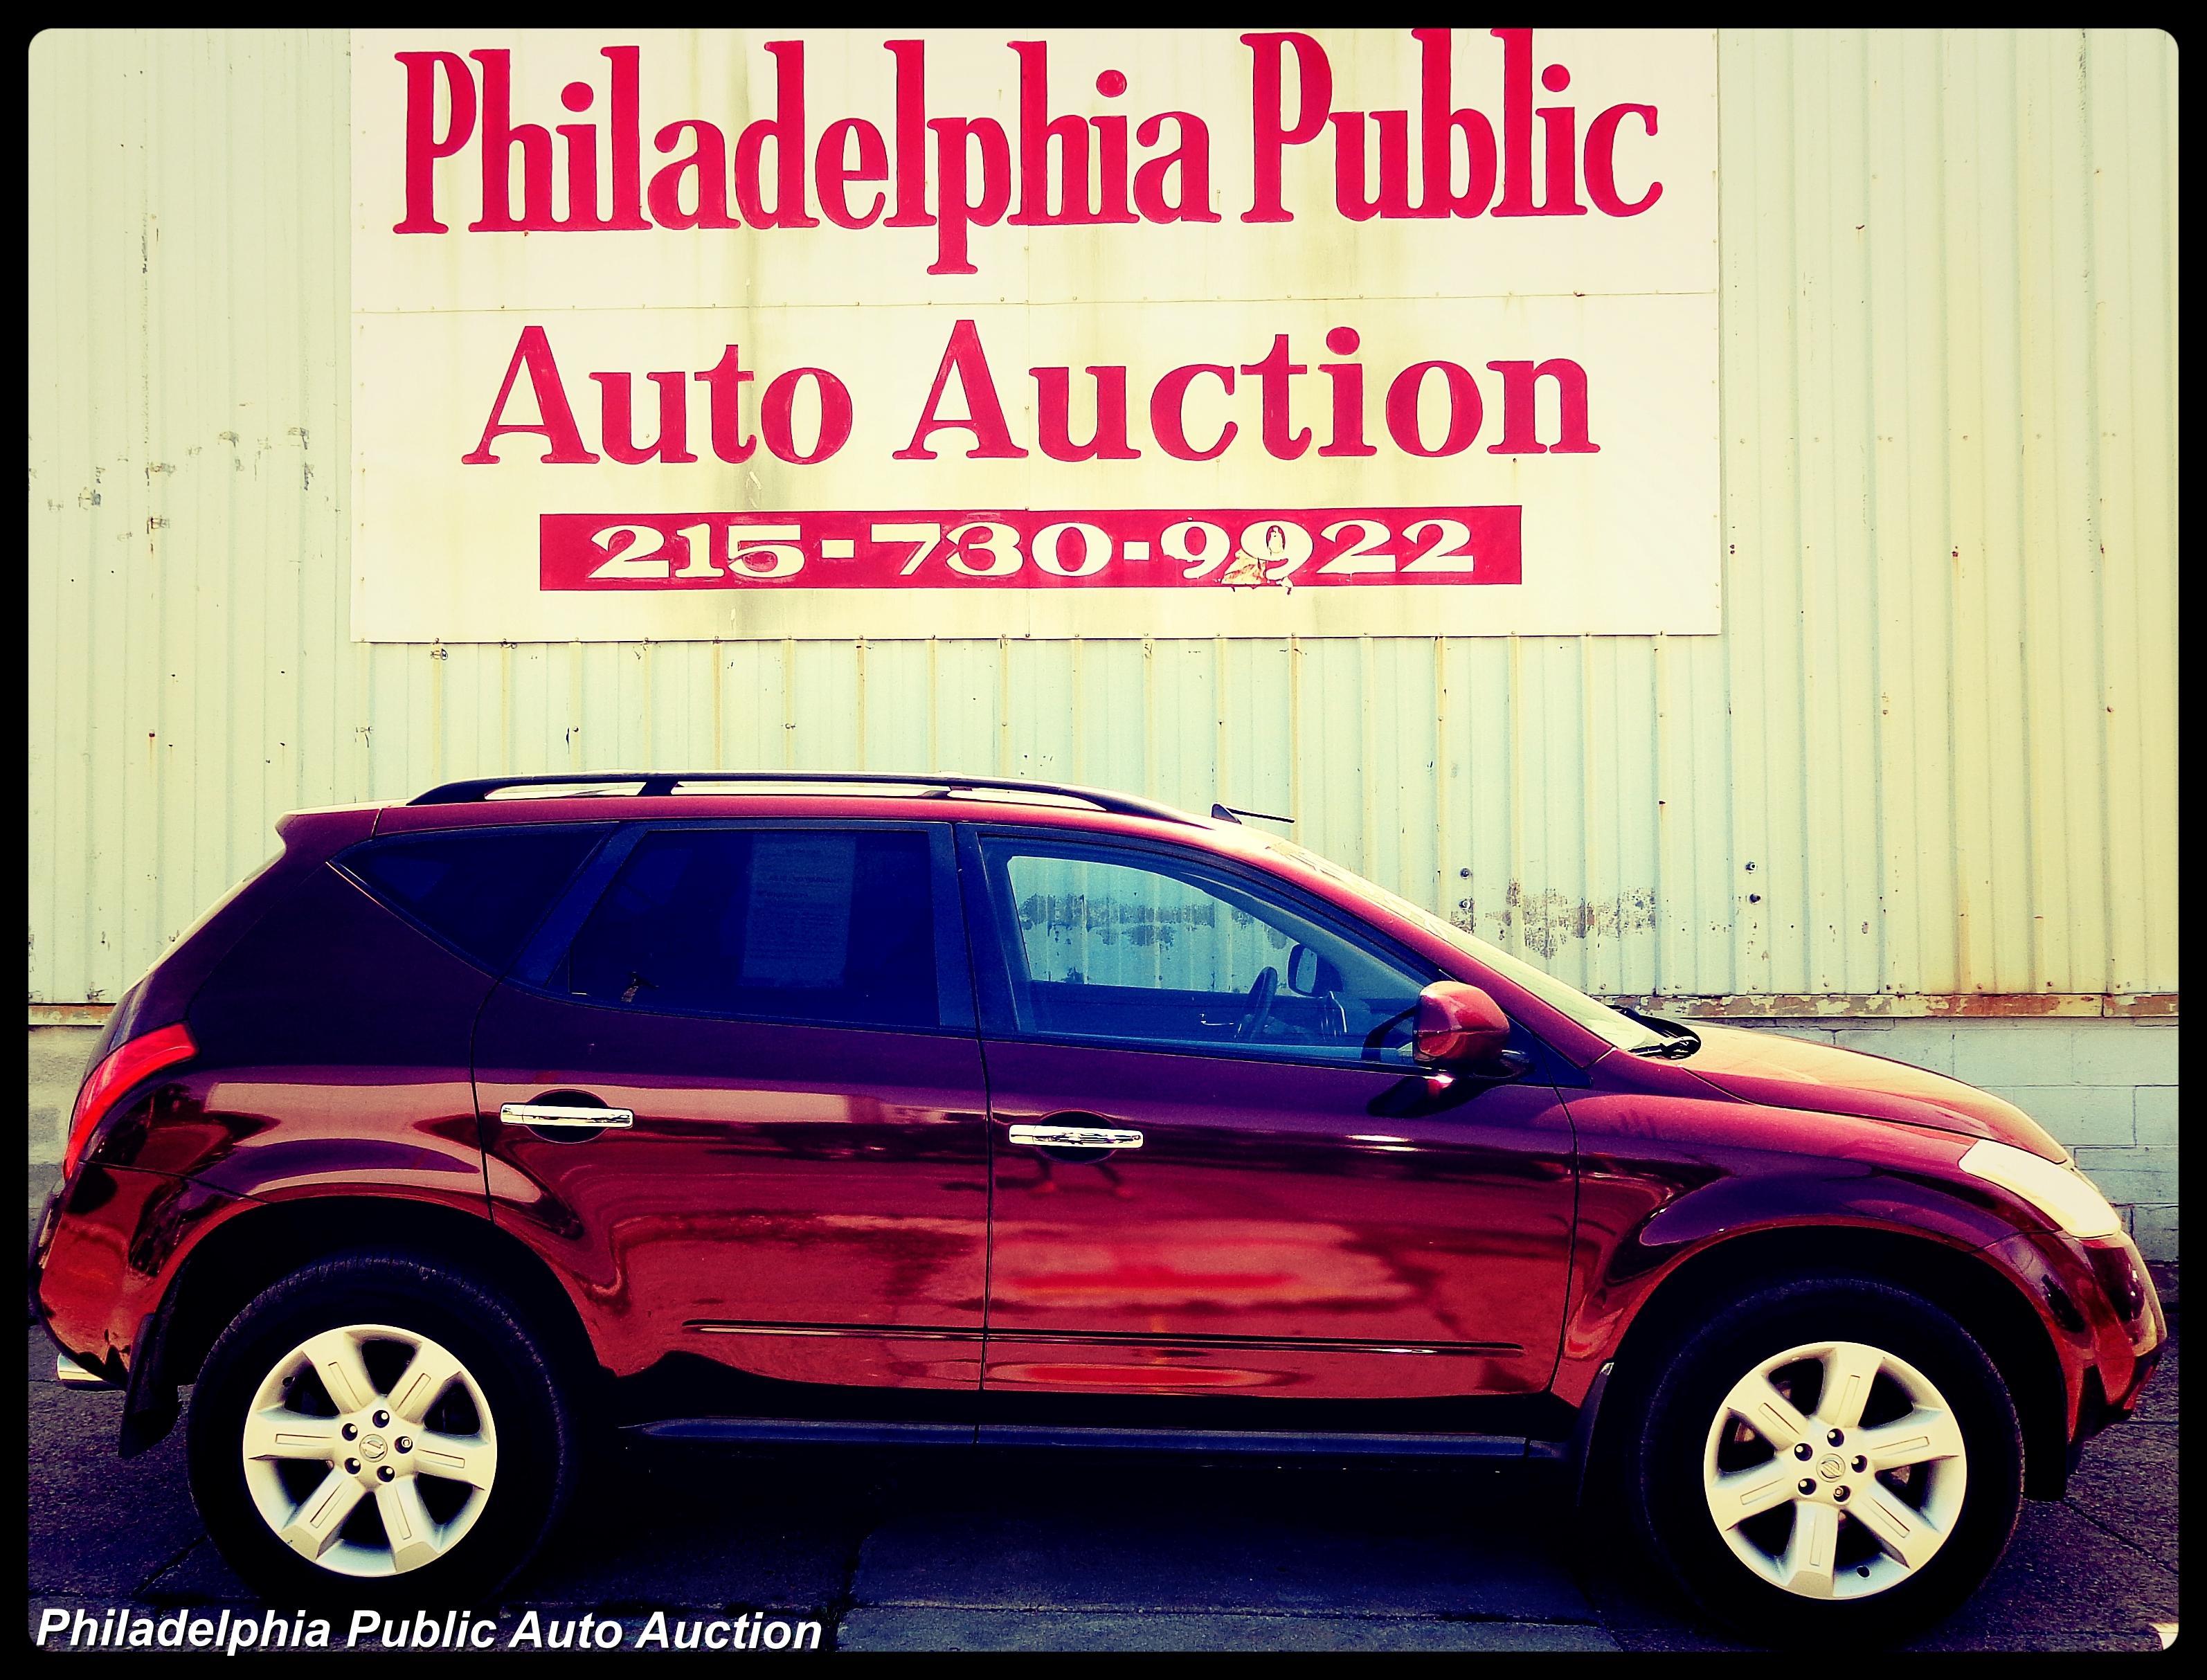 Car Auctions Near Philadelphia Pa